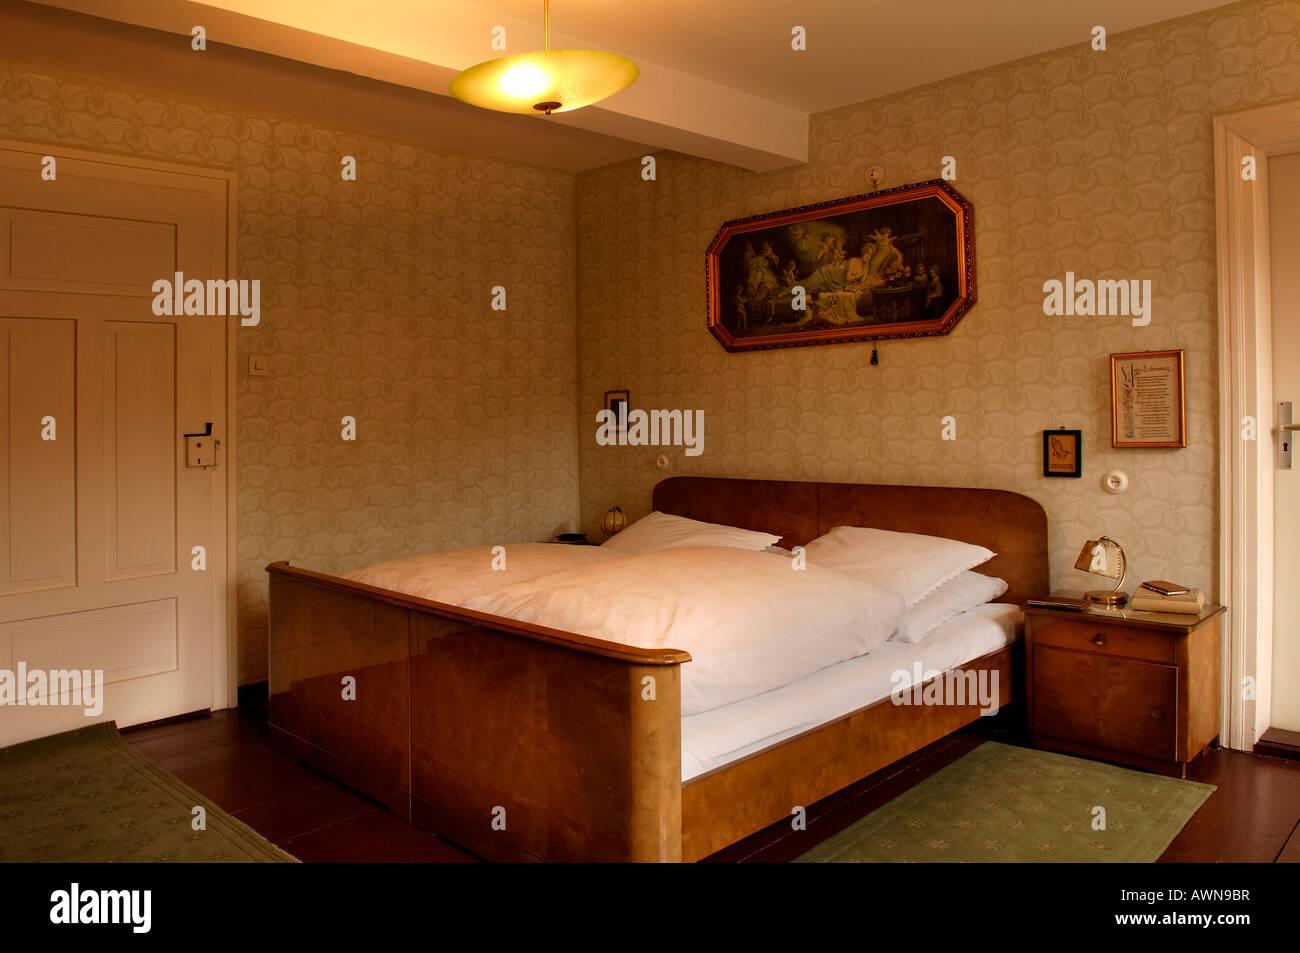 Comodini Immagini E Fotos Stock Alamy